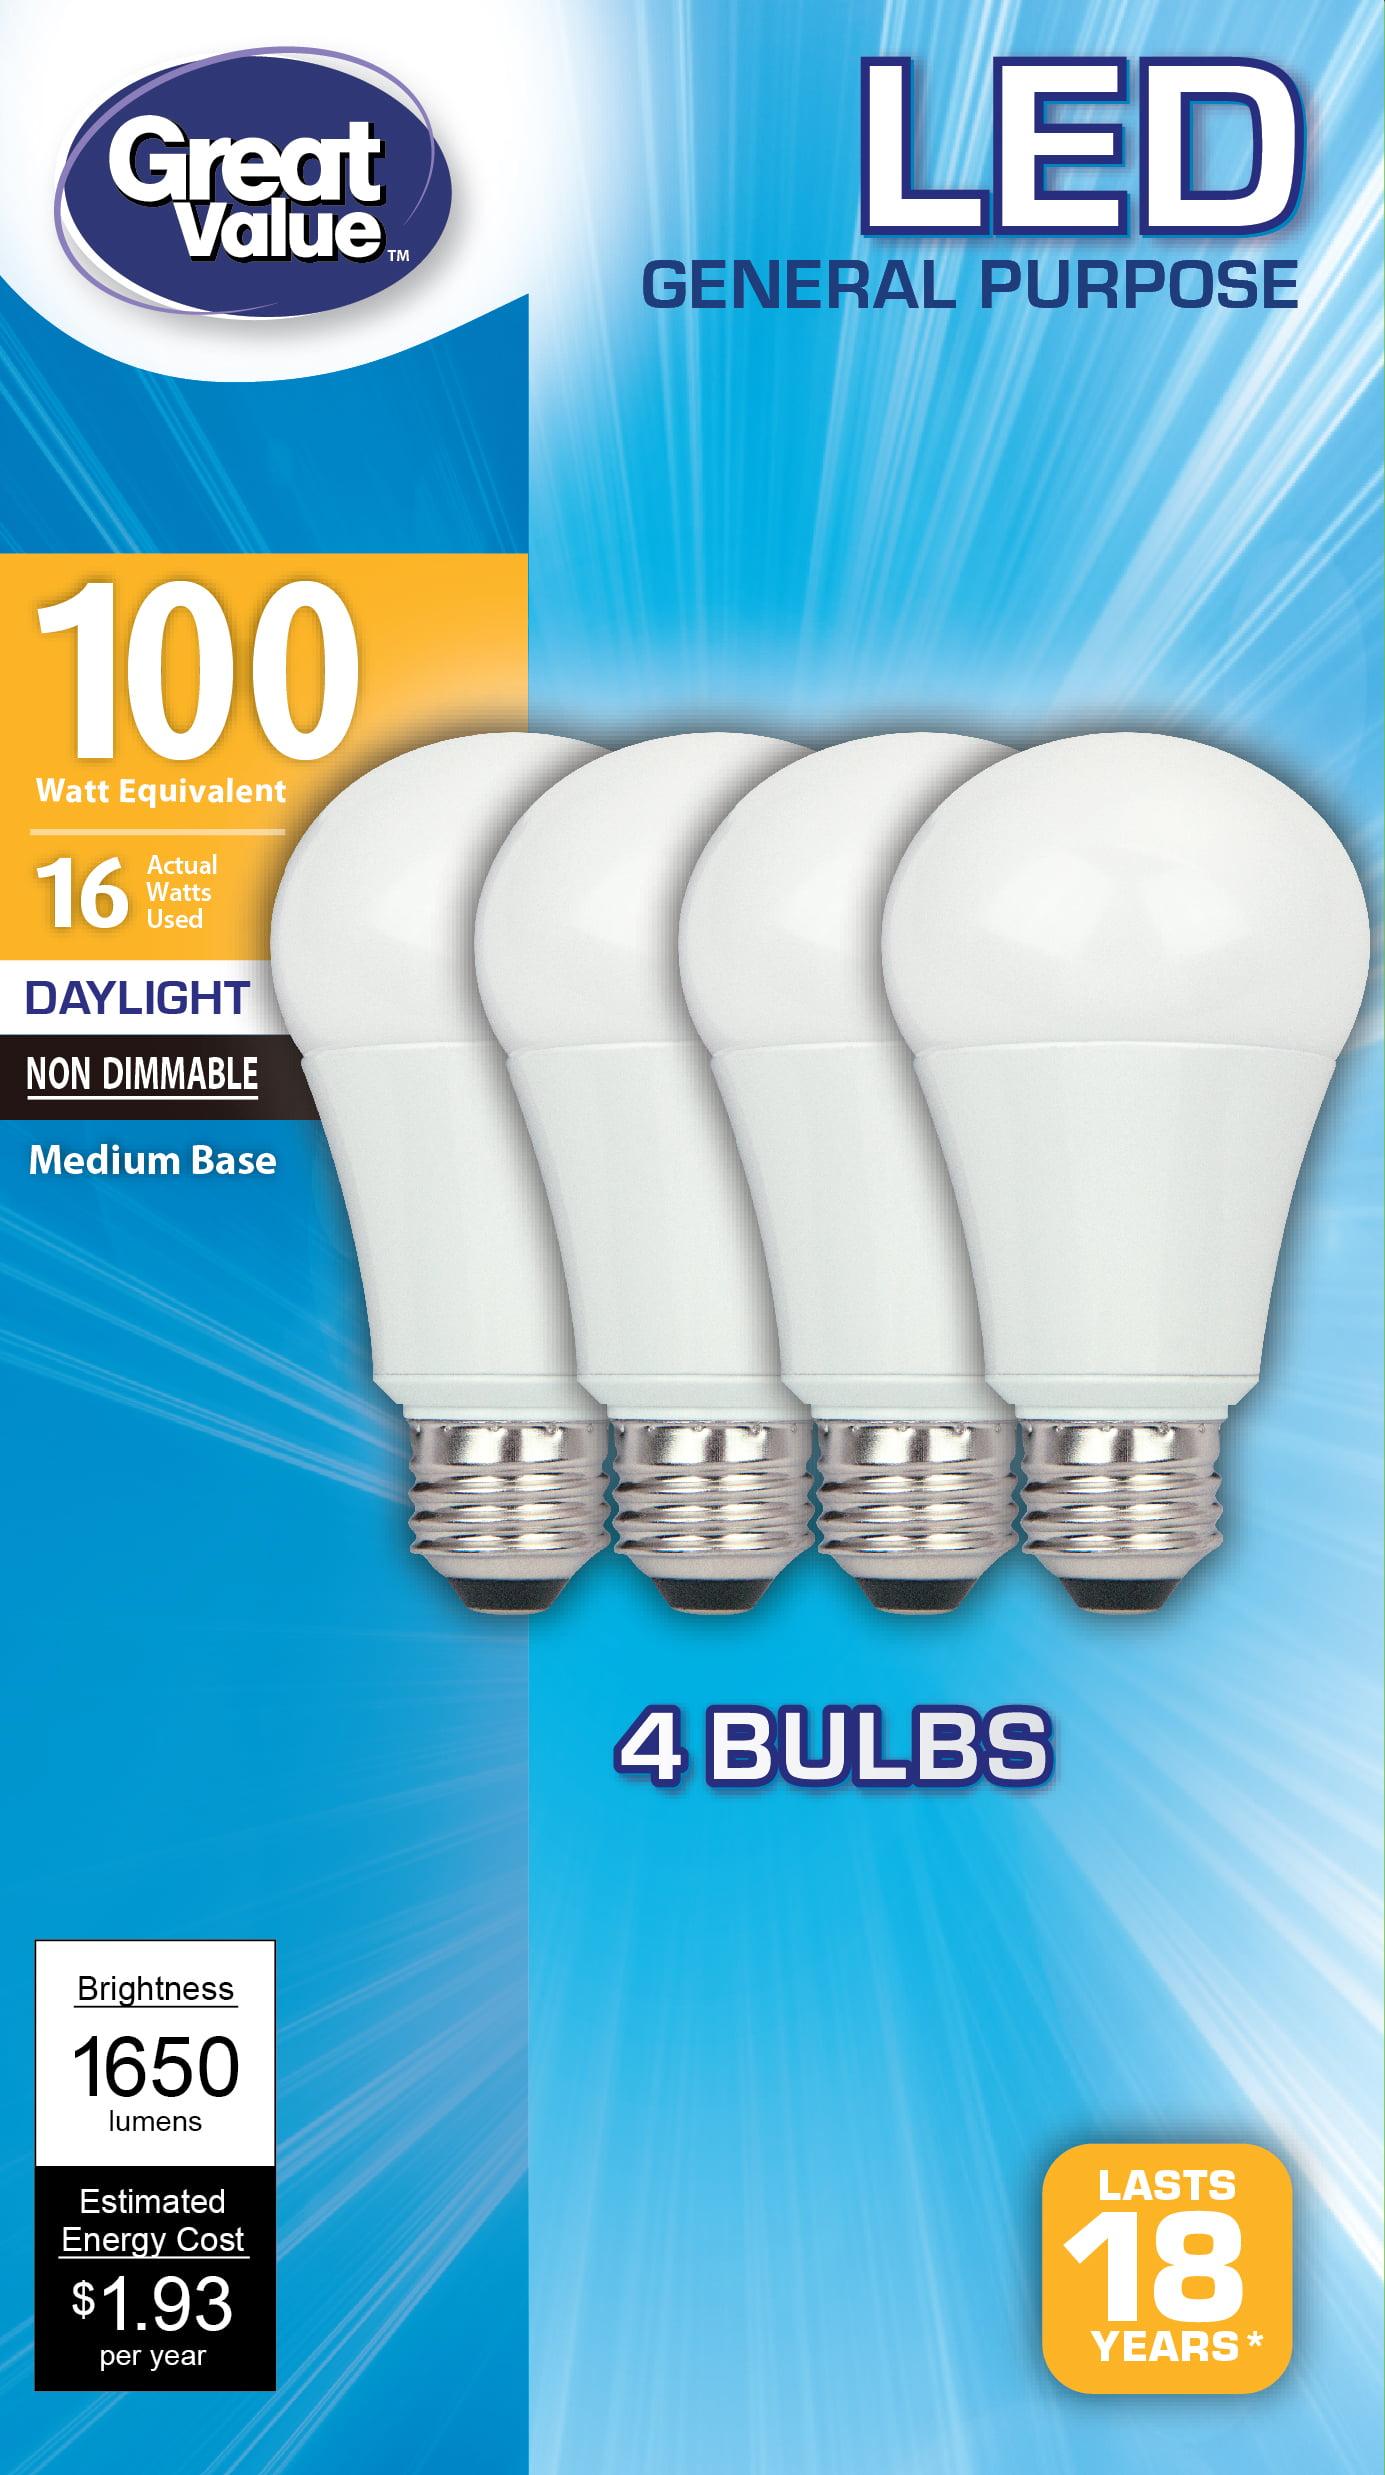 Led Light Bulb Daylight: Great Value LED A19 (E26) Light Bulbs, 16W (100W